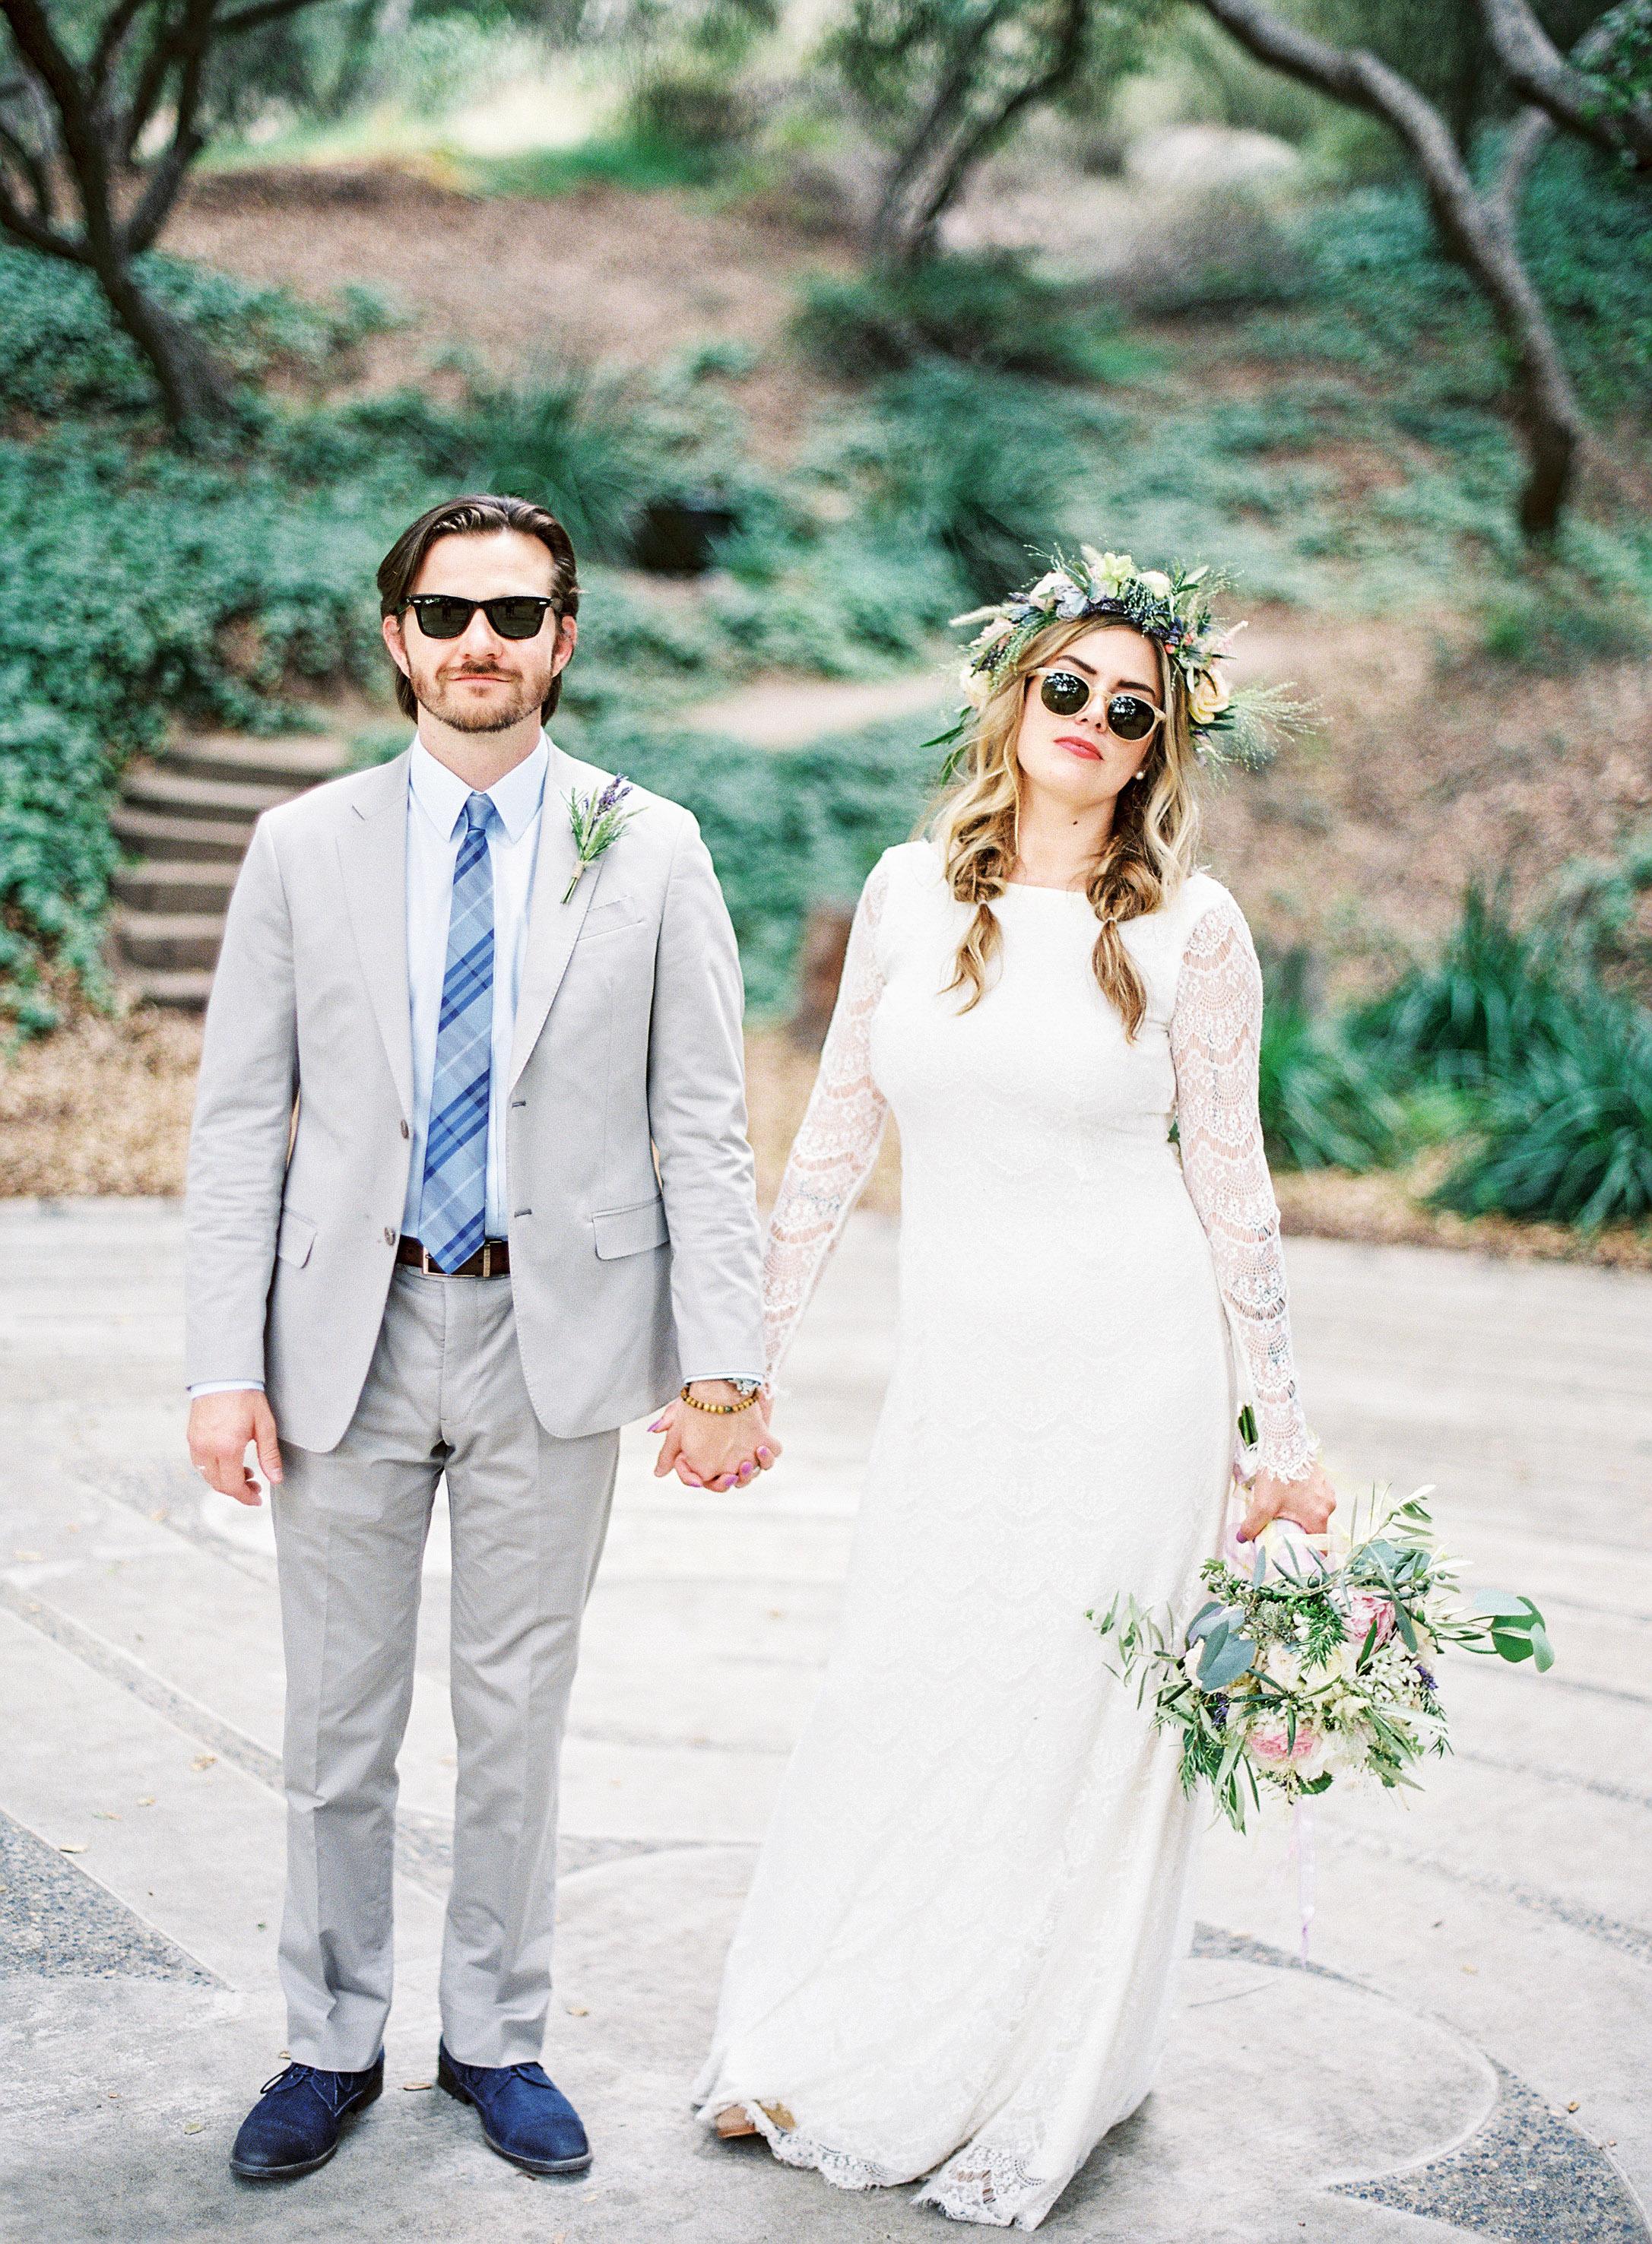 jackie dave wedding sunglasses